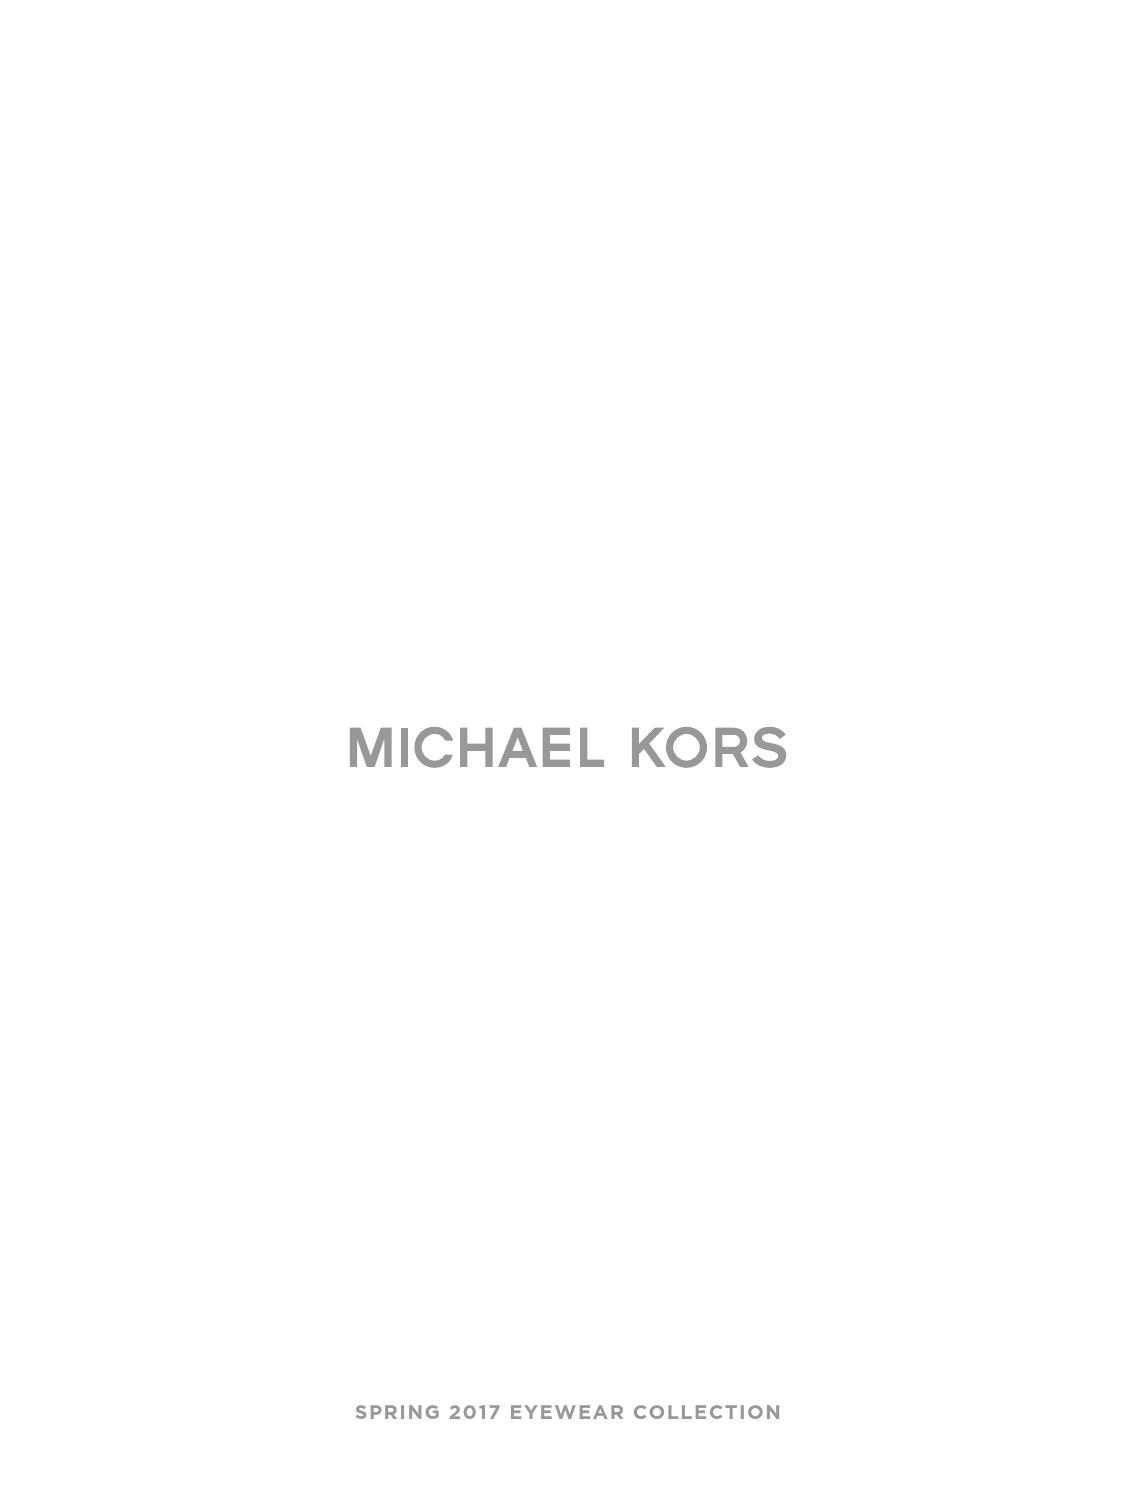 d911ded68794 MICHAEL KORS by HOptical - issuu